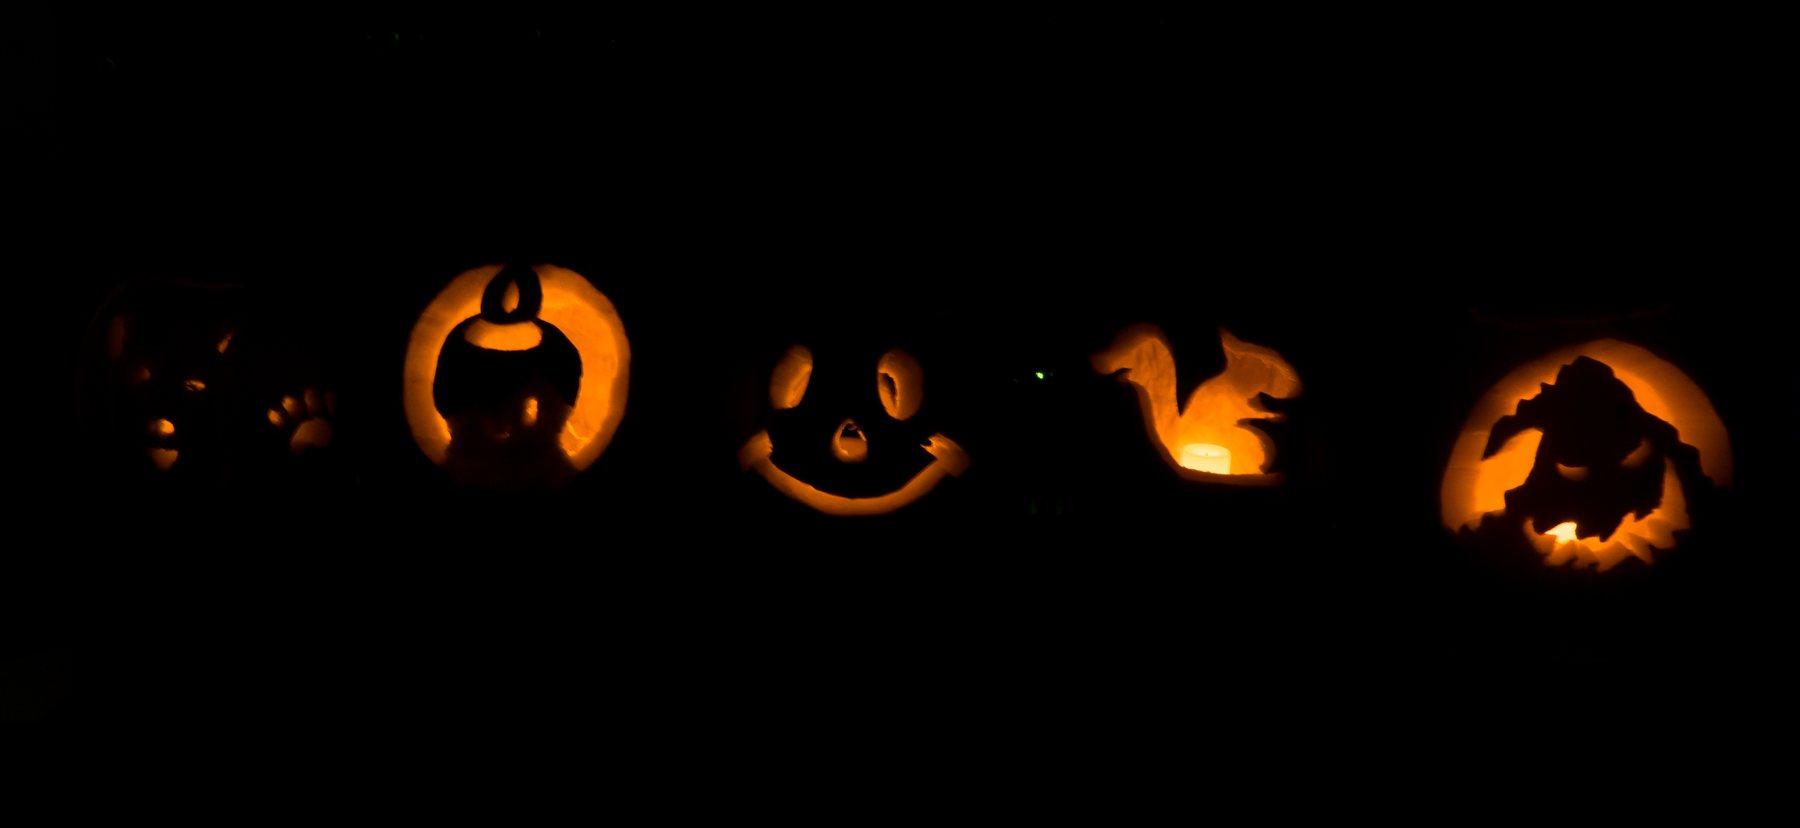 five silhouettes of jack-o-lanterns